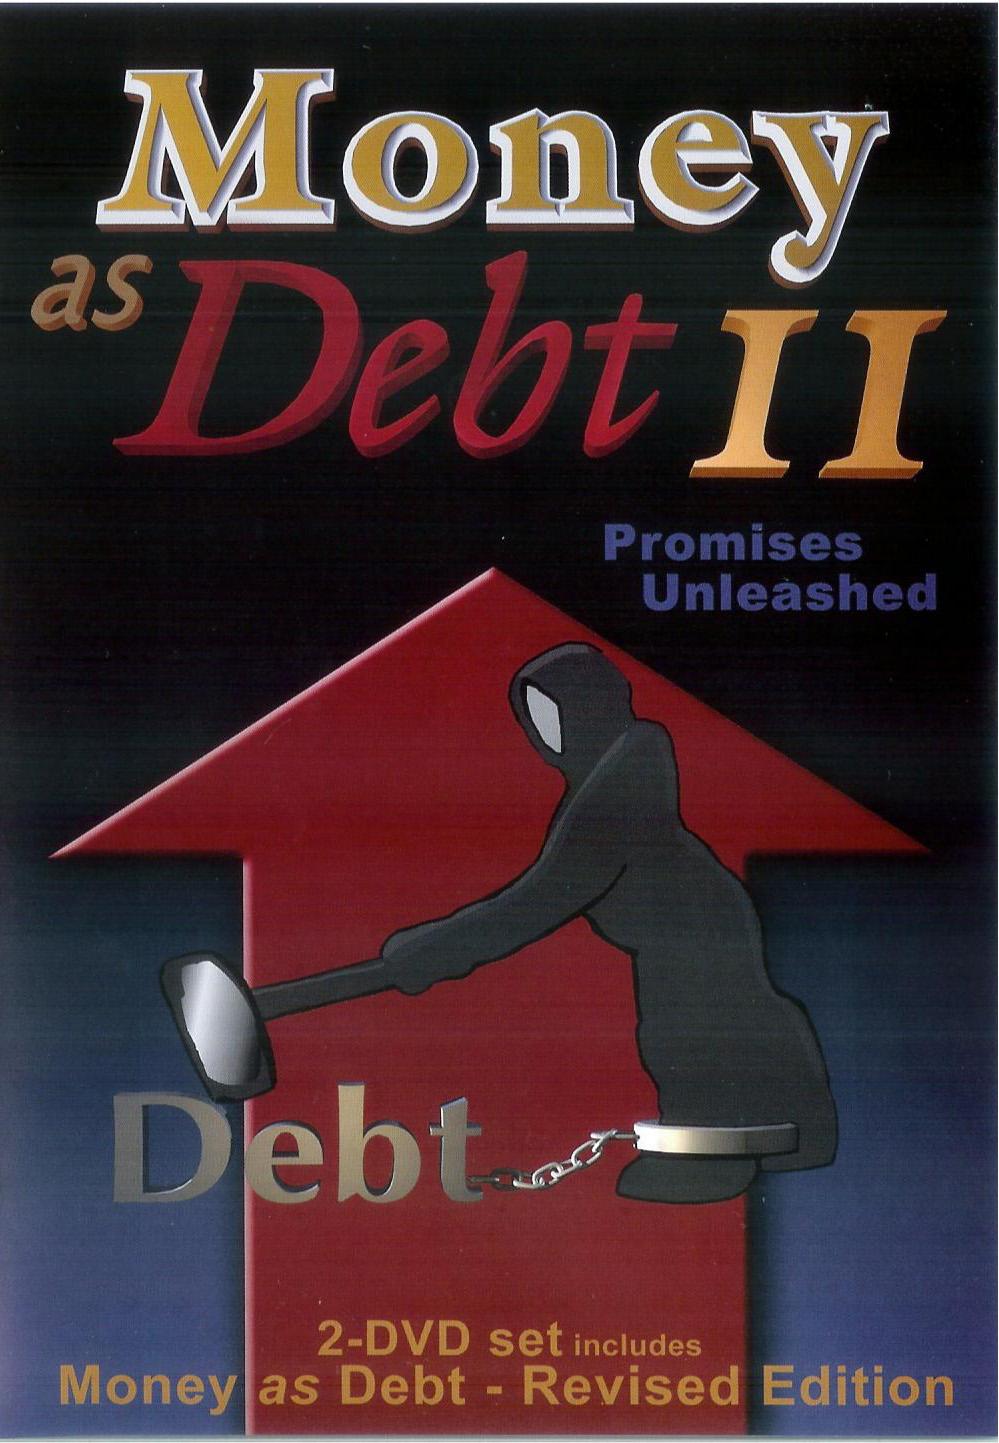 Money as debt south santa rosa news.